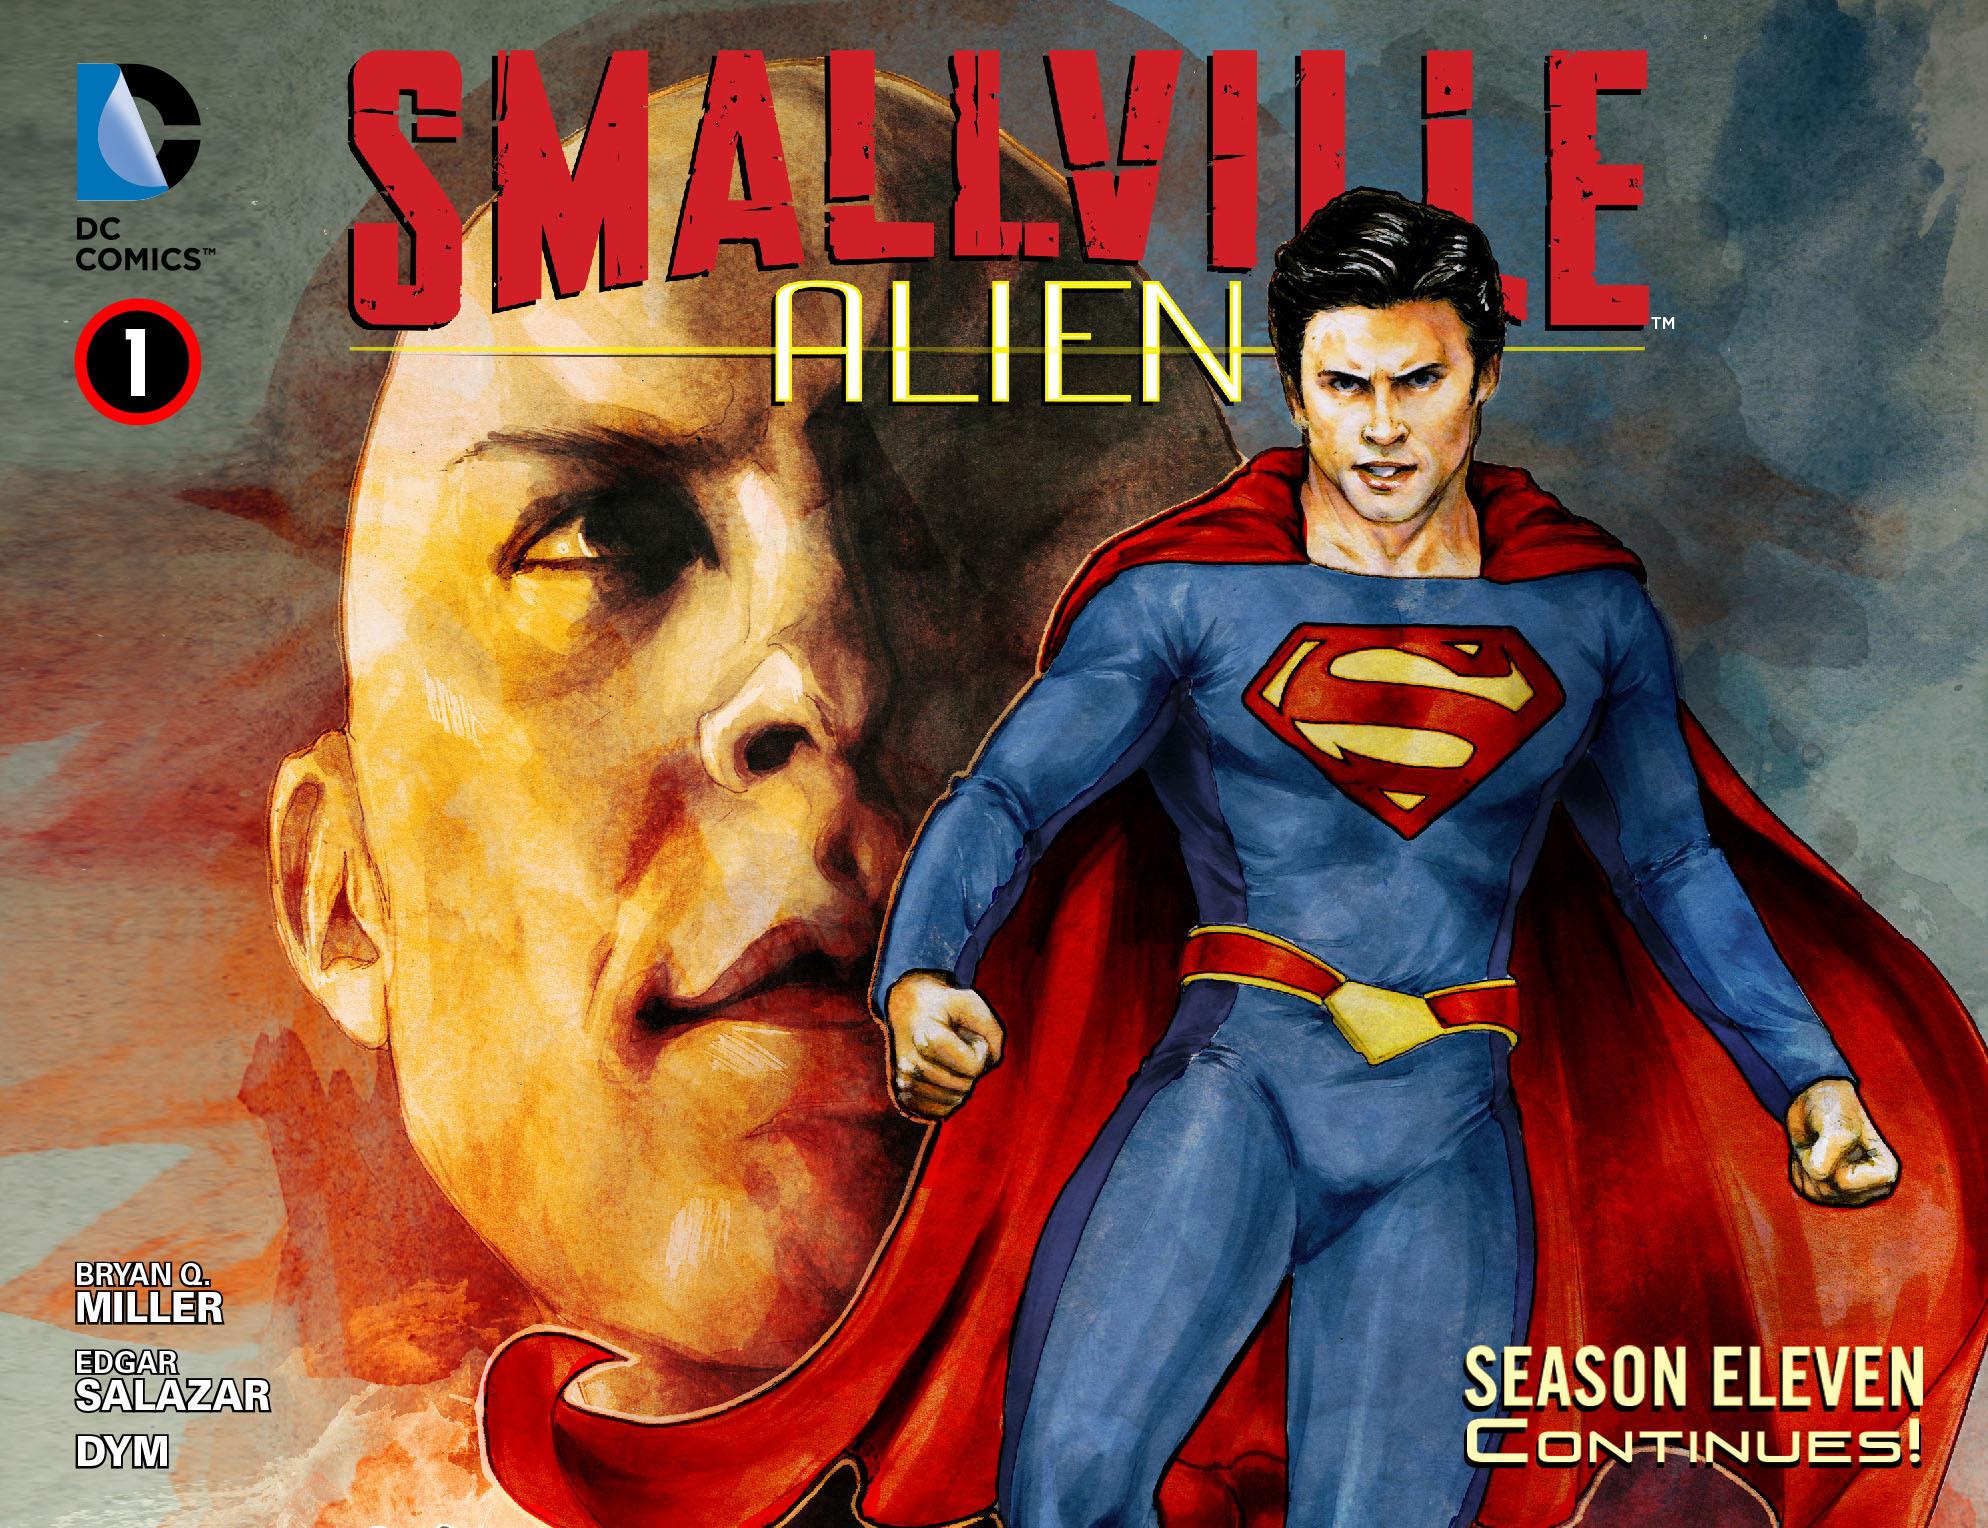 Read online Smallville: Alien comic -  Issue #1 - 1